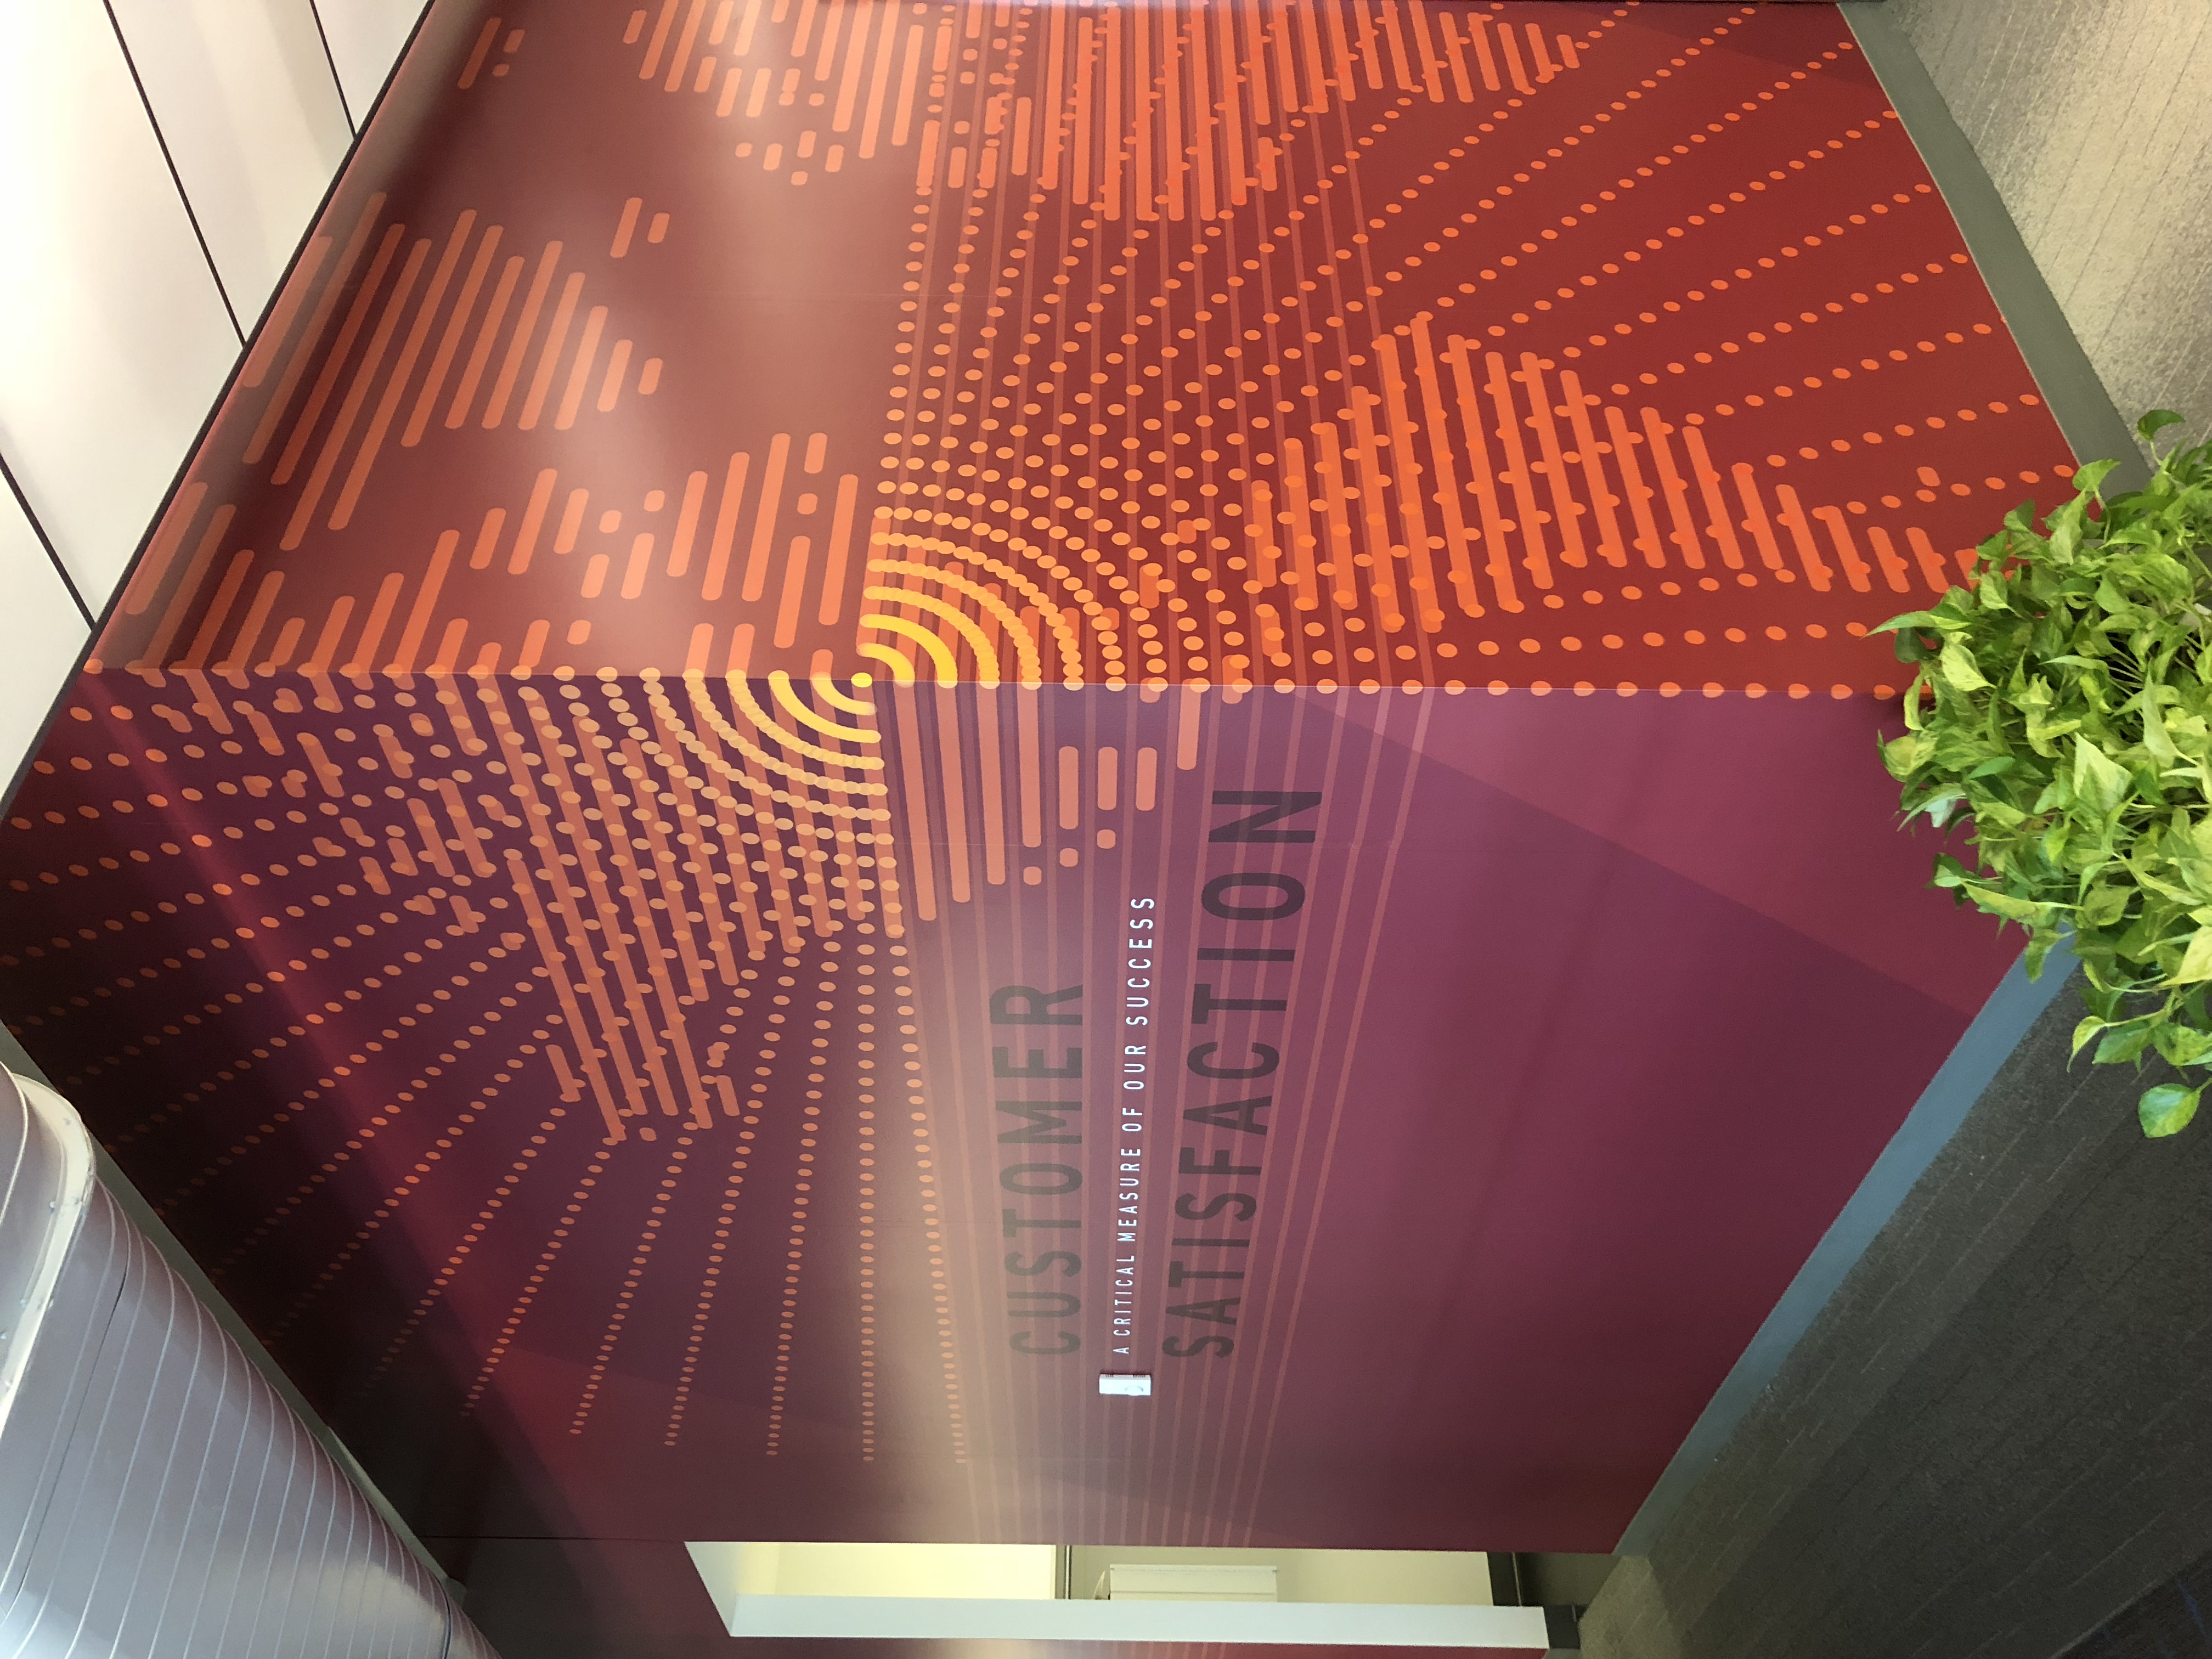 Wall graphics installation by VisuCom Graphics